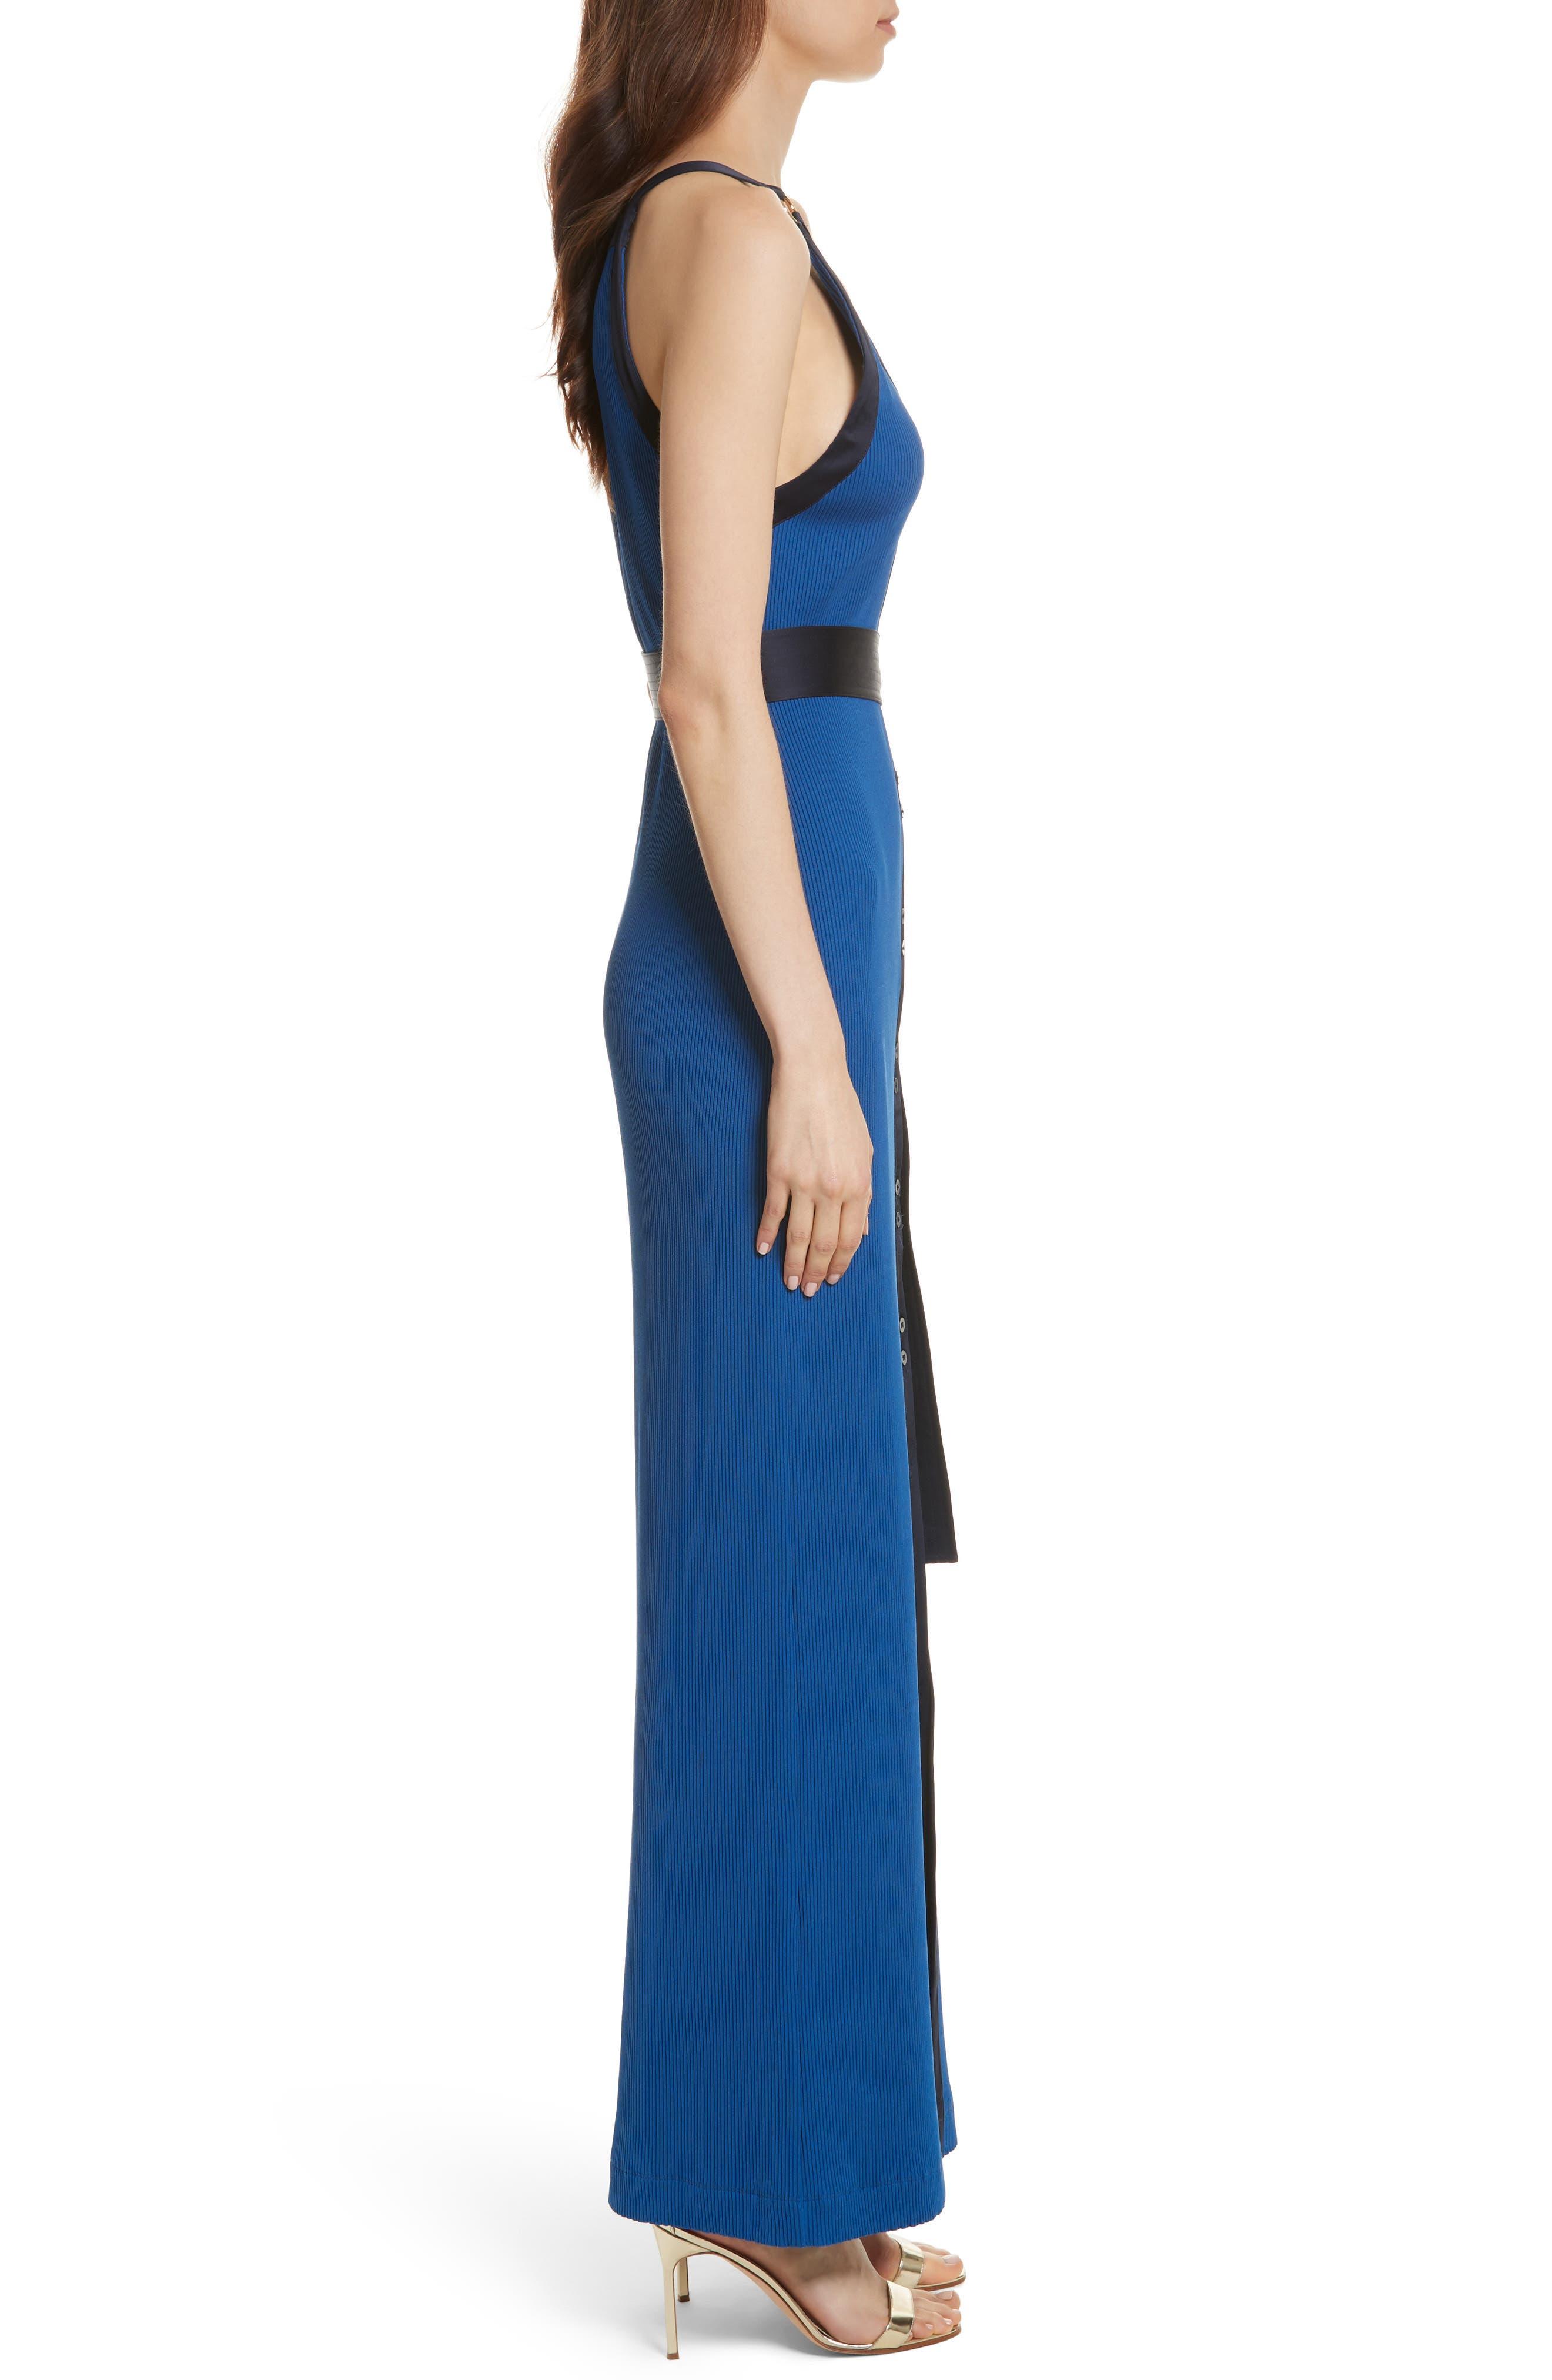 Diane von Furstenberg Ribbed Jersey Maxi Dress,                             Alternate thumbnail 3, color,                             412